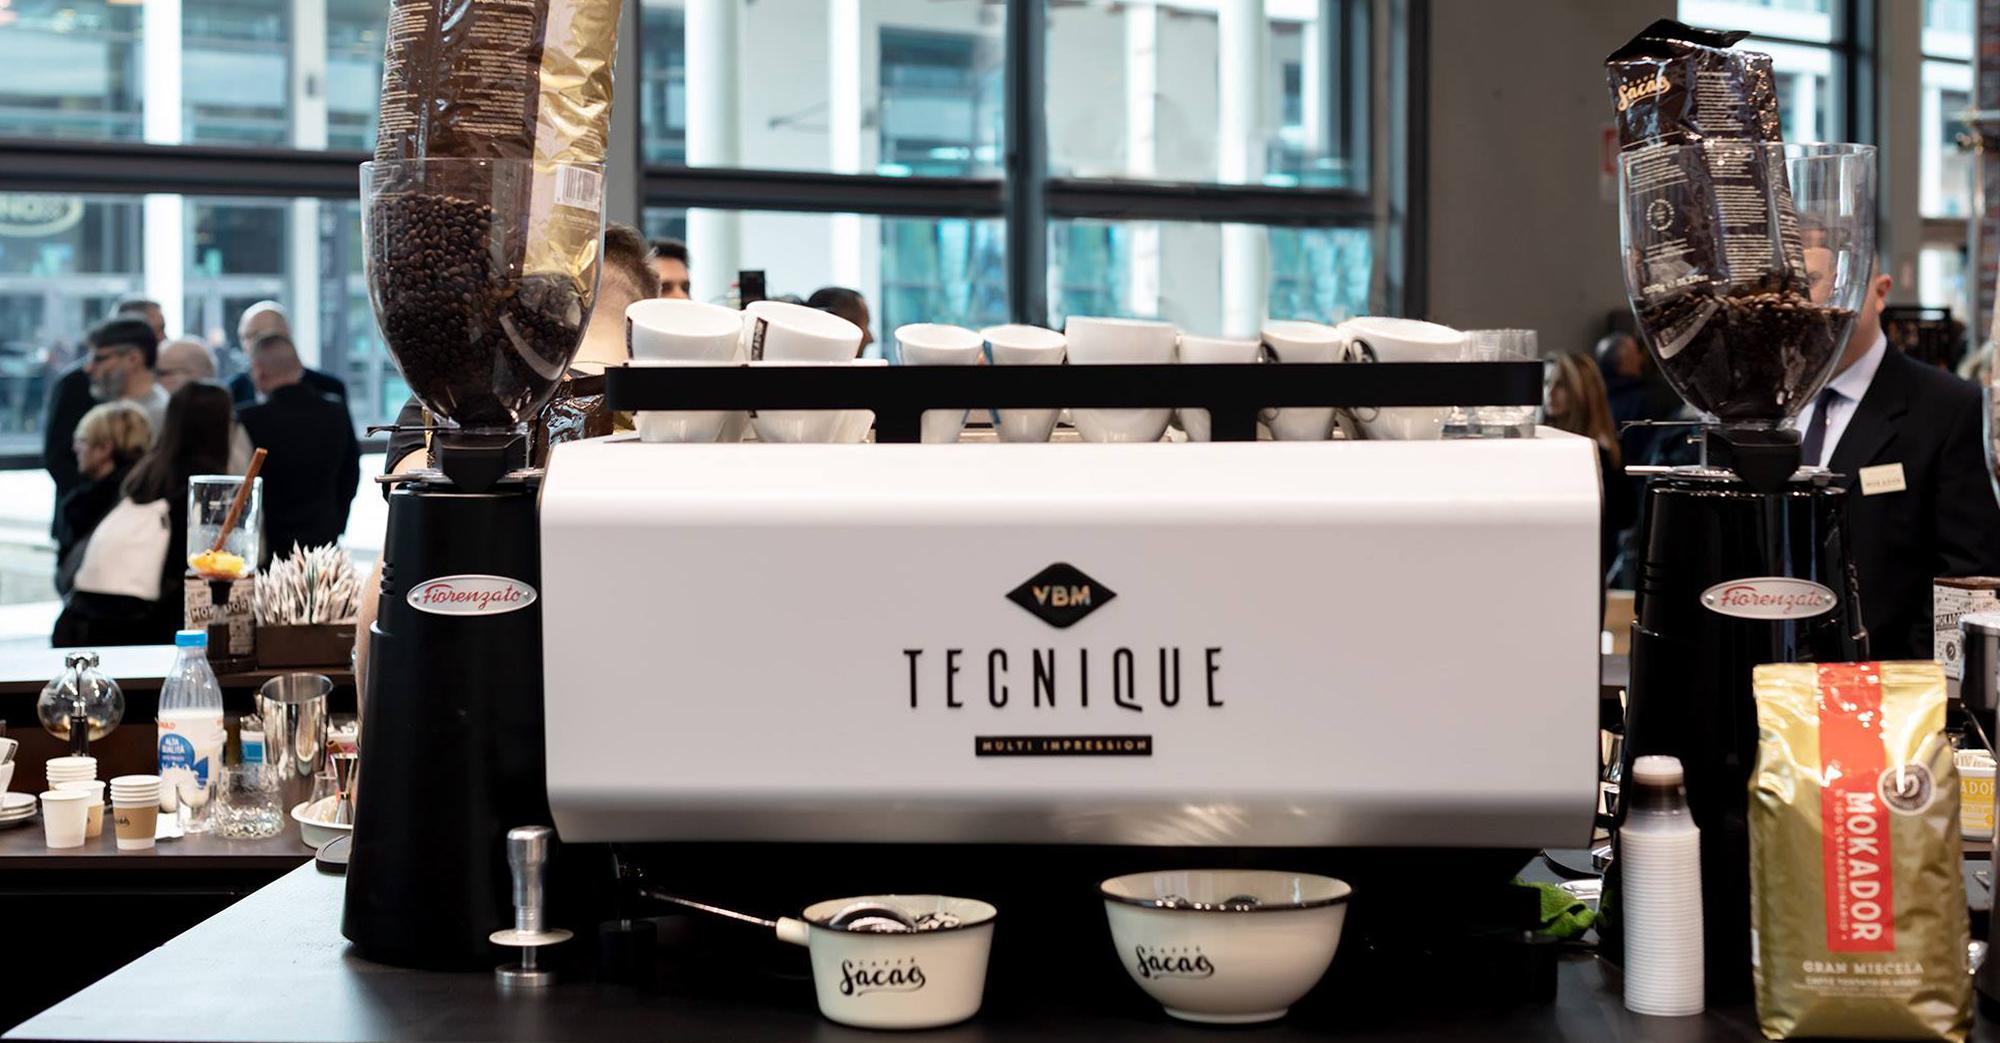 Vibiemme espressomachine